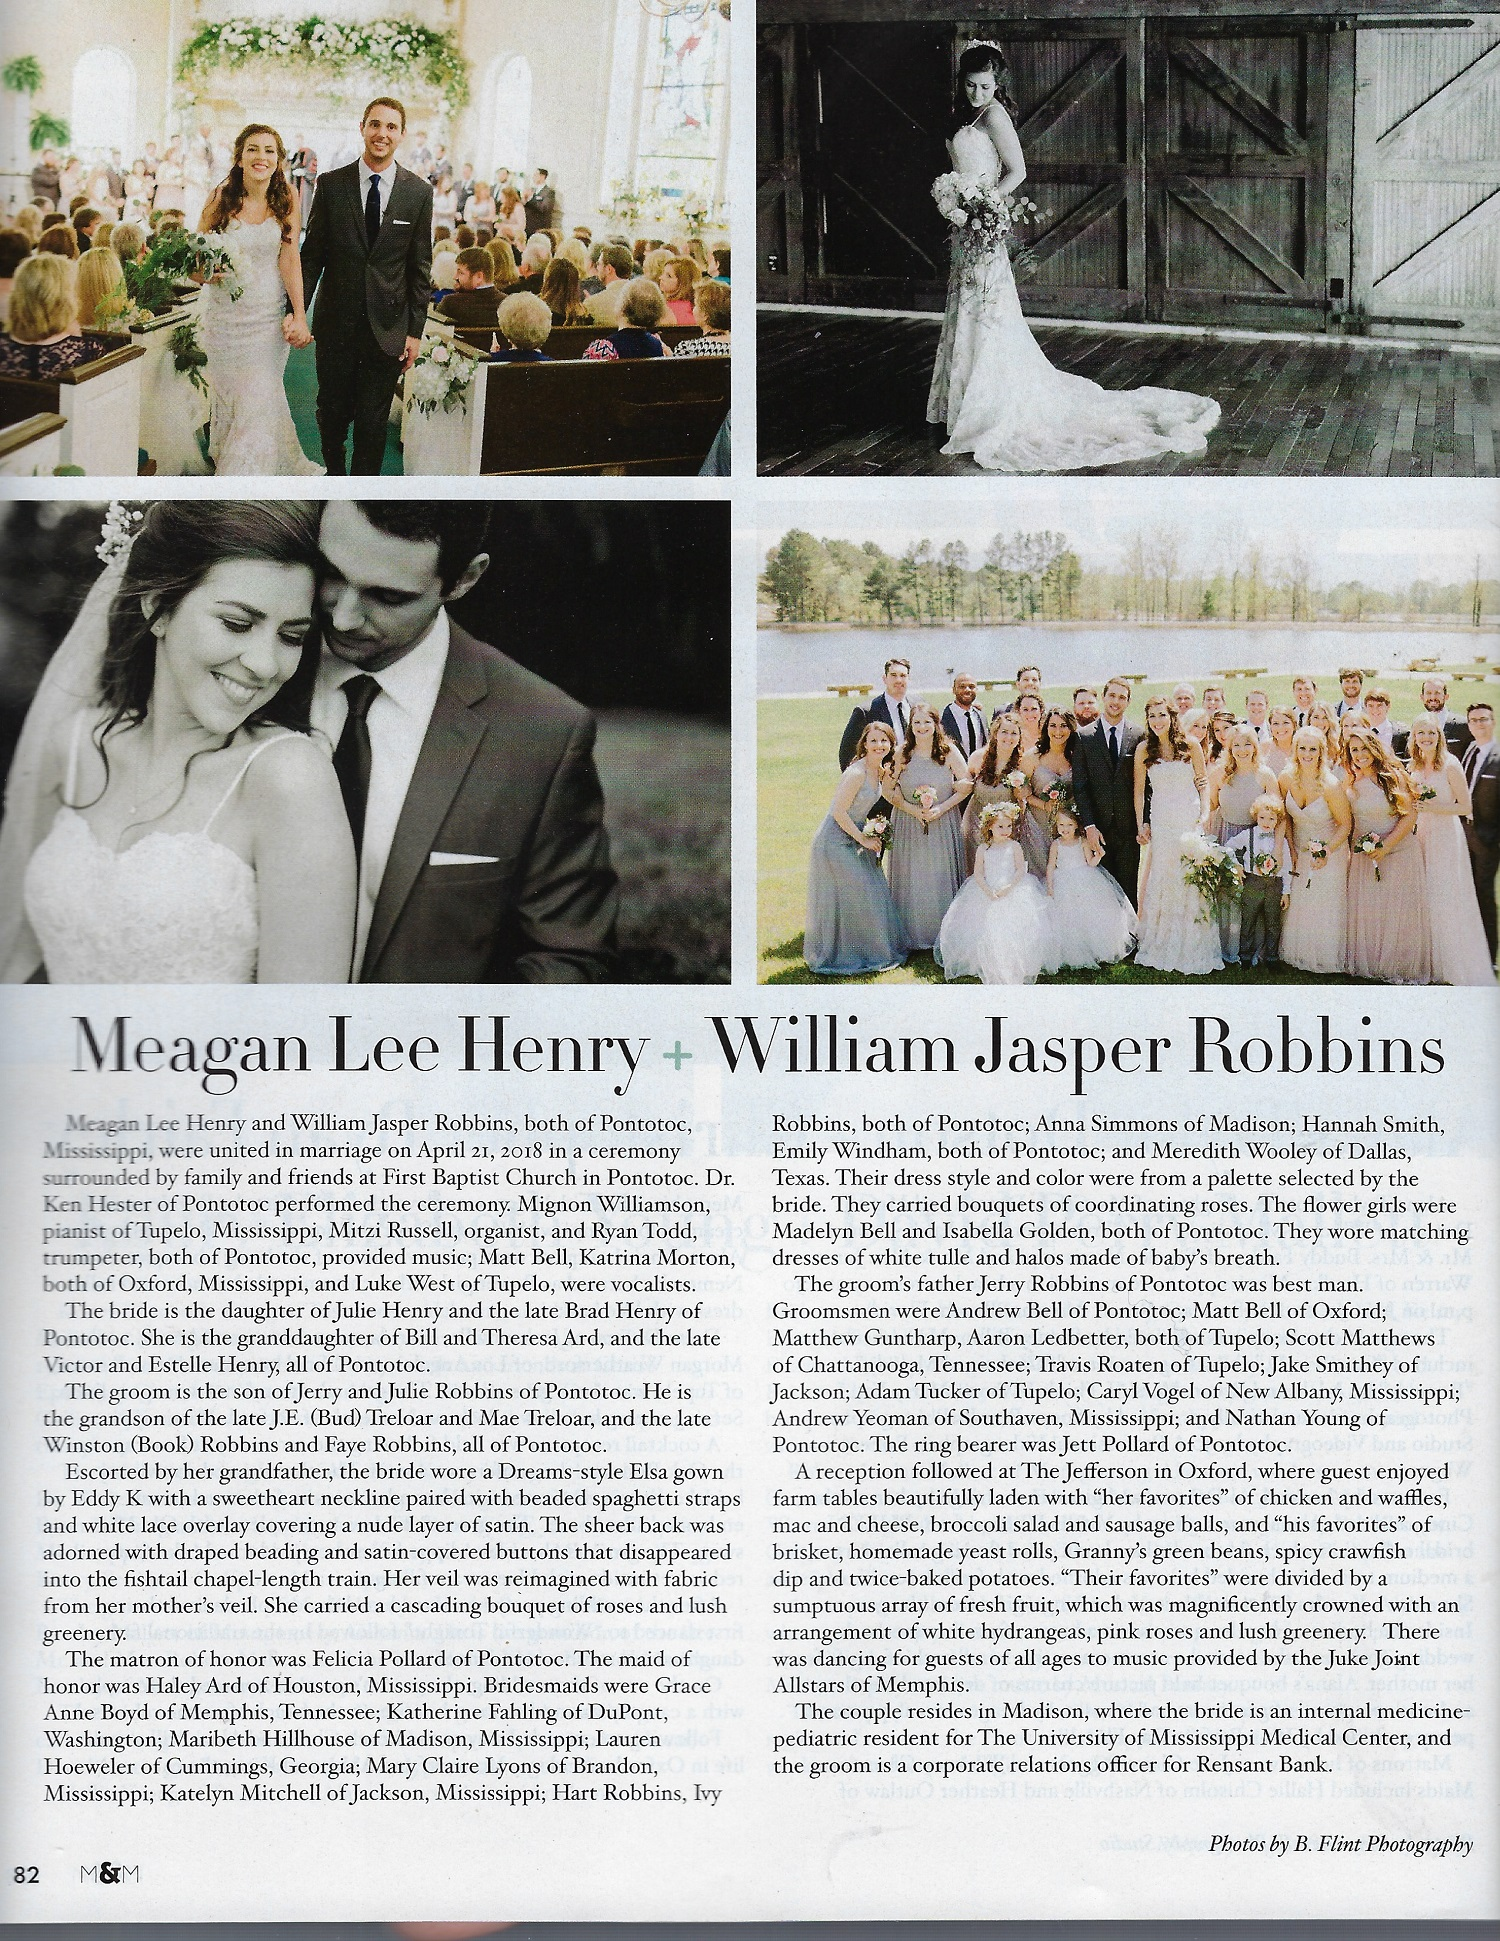 mudMagnolia Henry Robbins page 1 - web.jpg